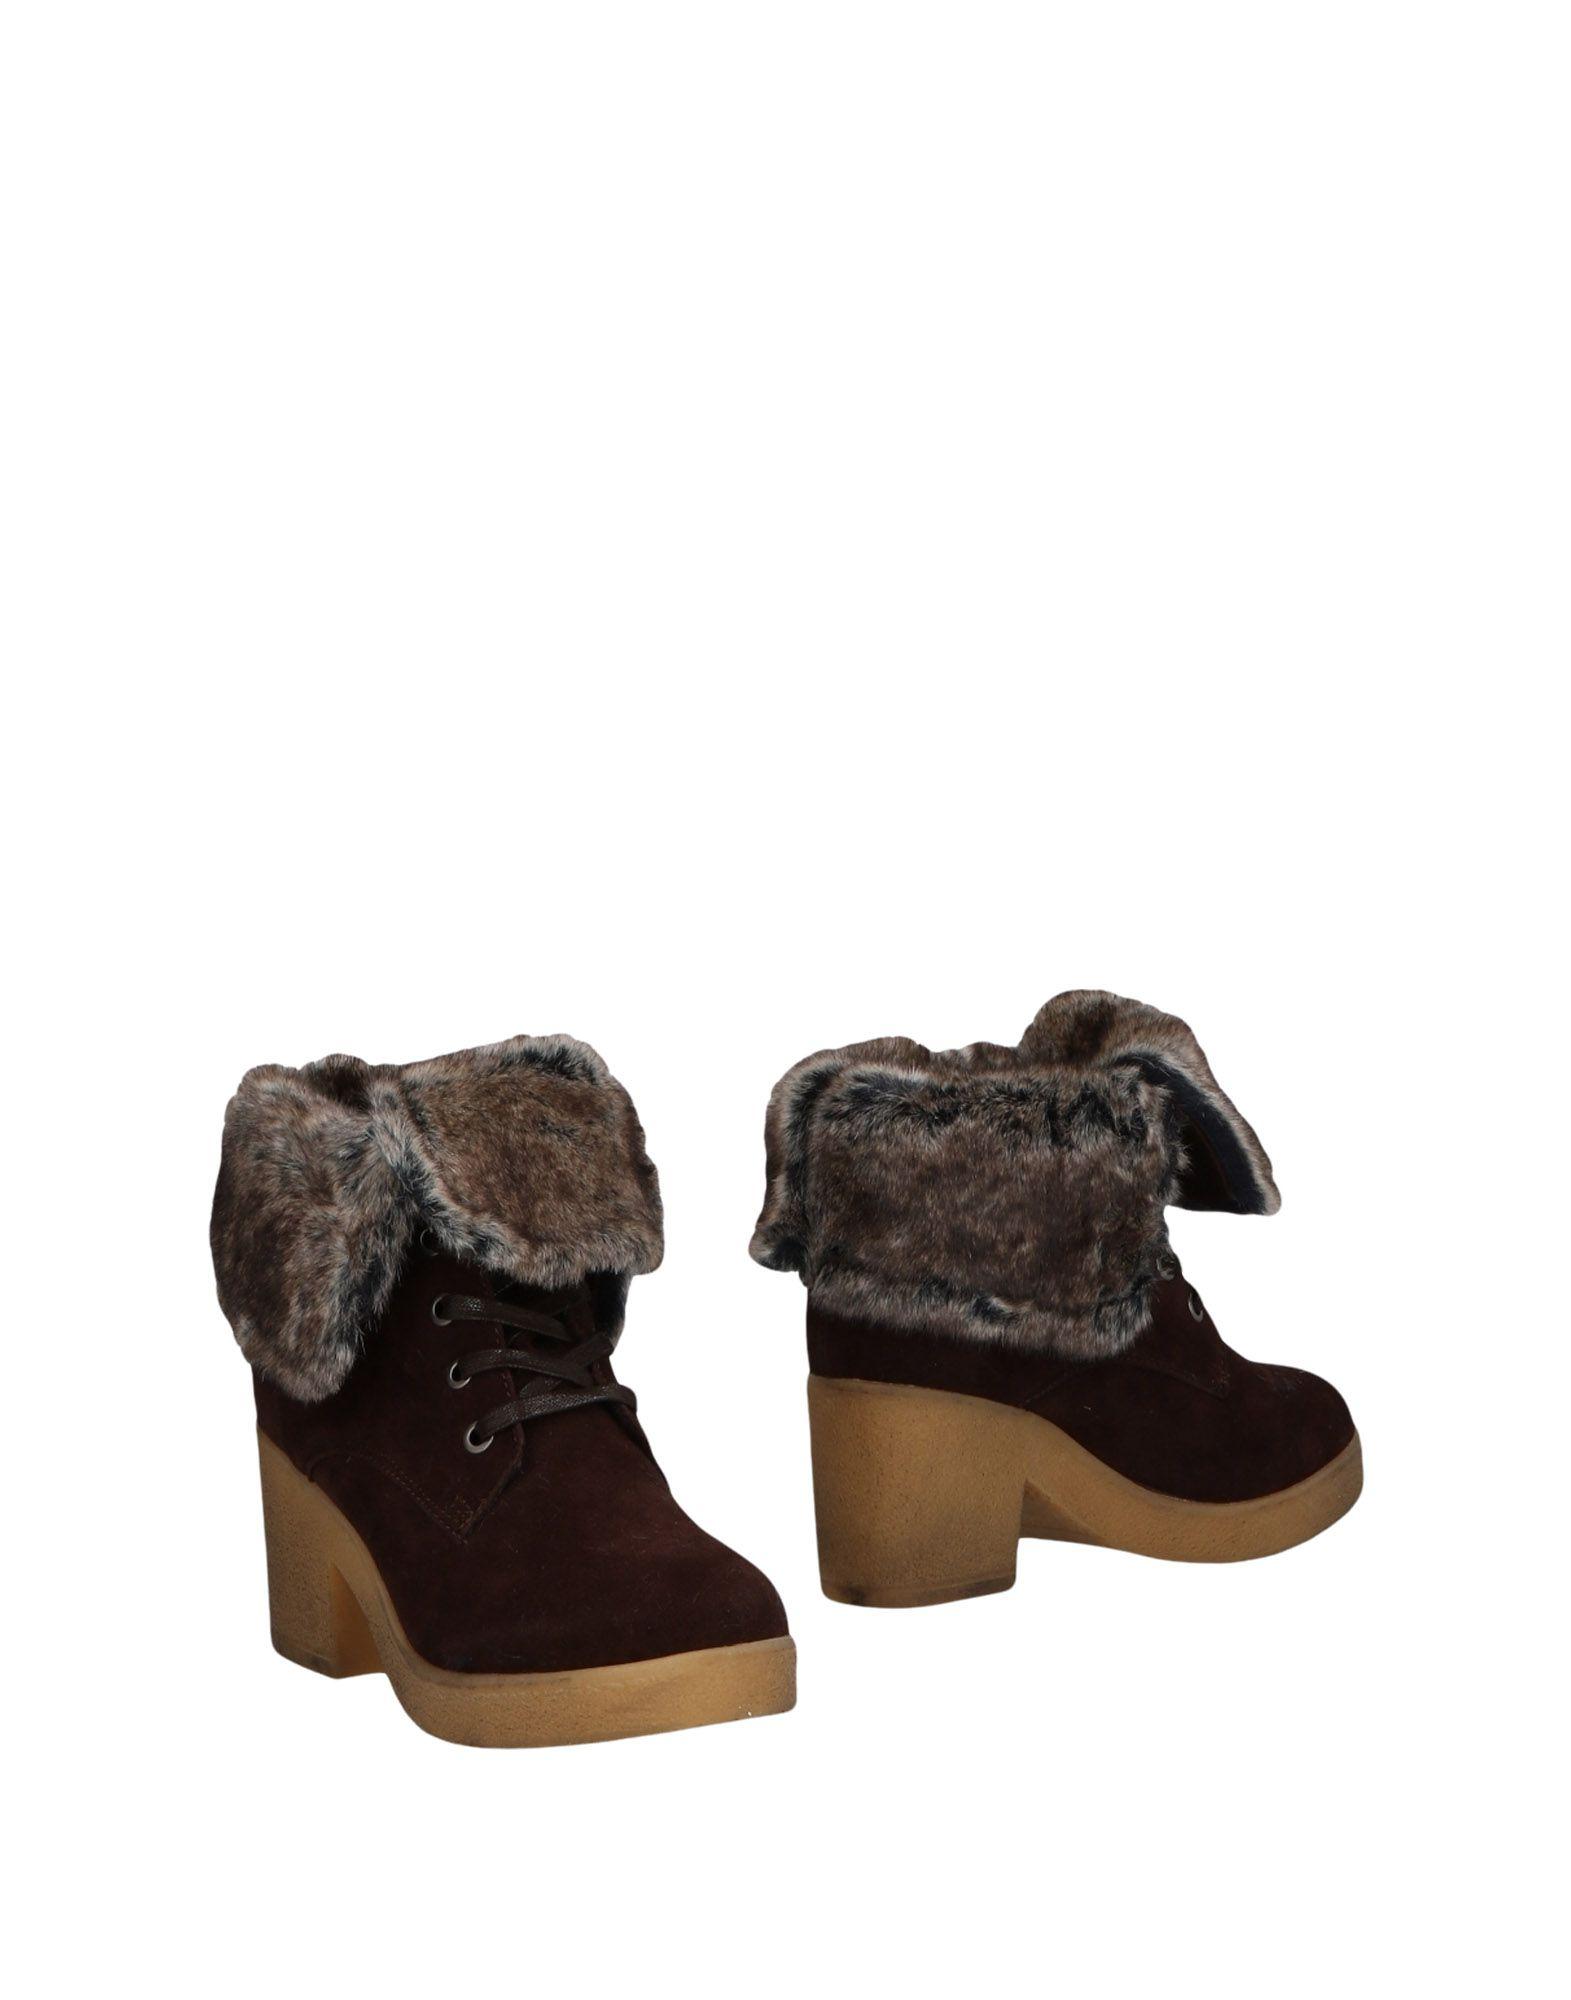 Cafènoir Stiefelette Damen beliebte  11478260SW Gute Qualität beliebte Damen Schuhe f772b2